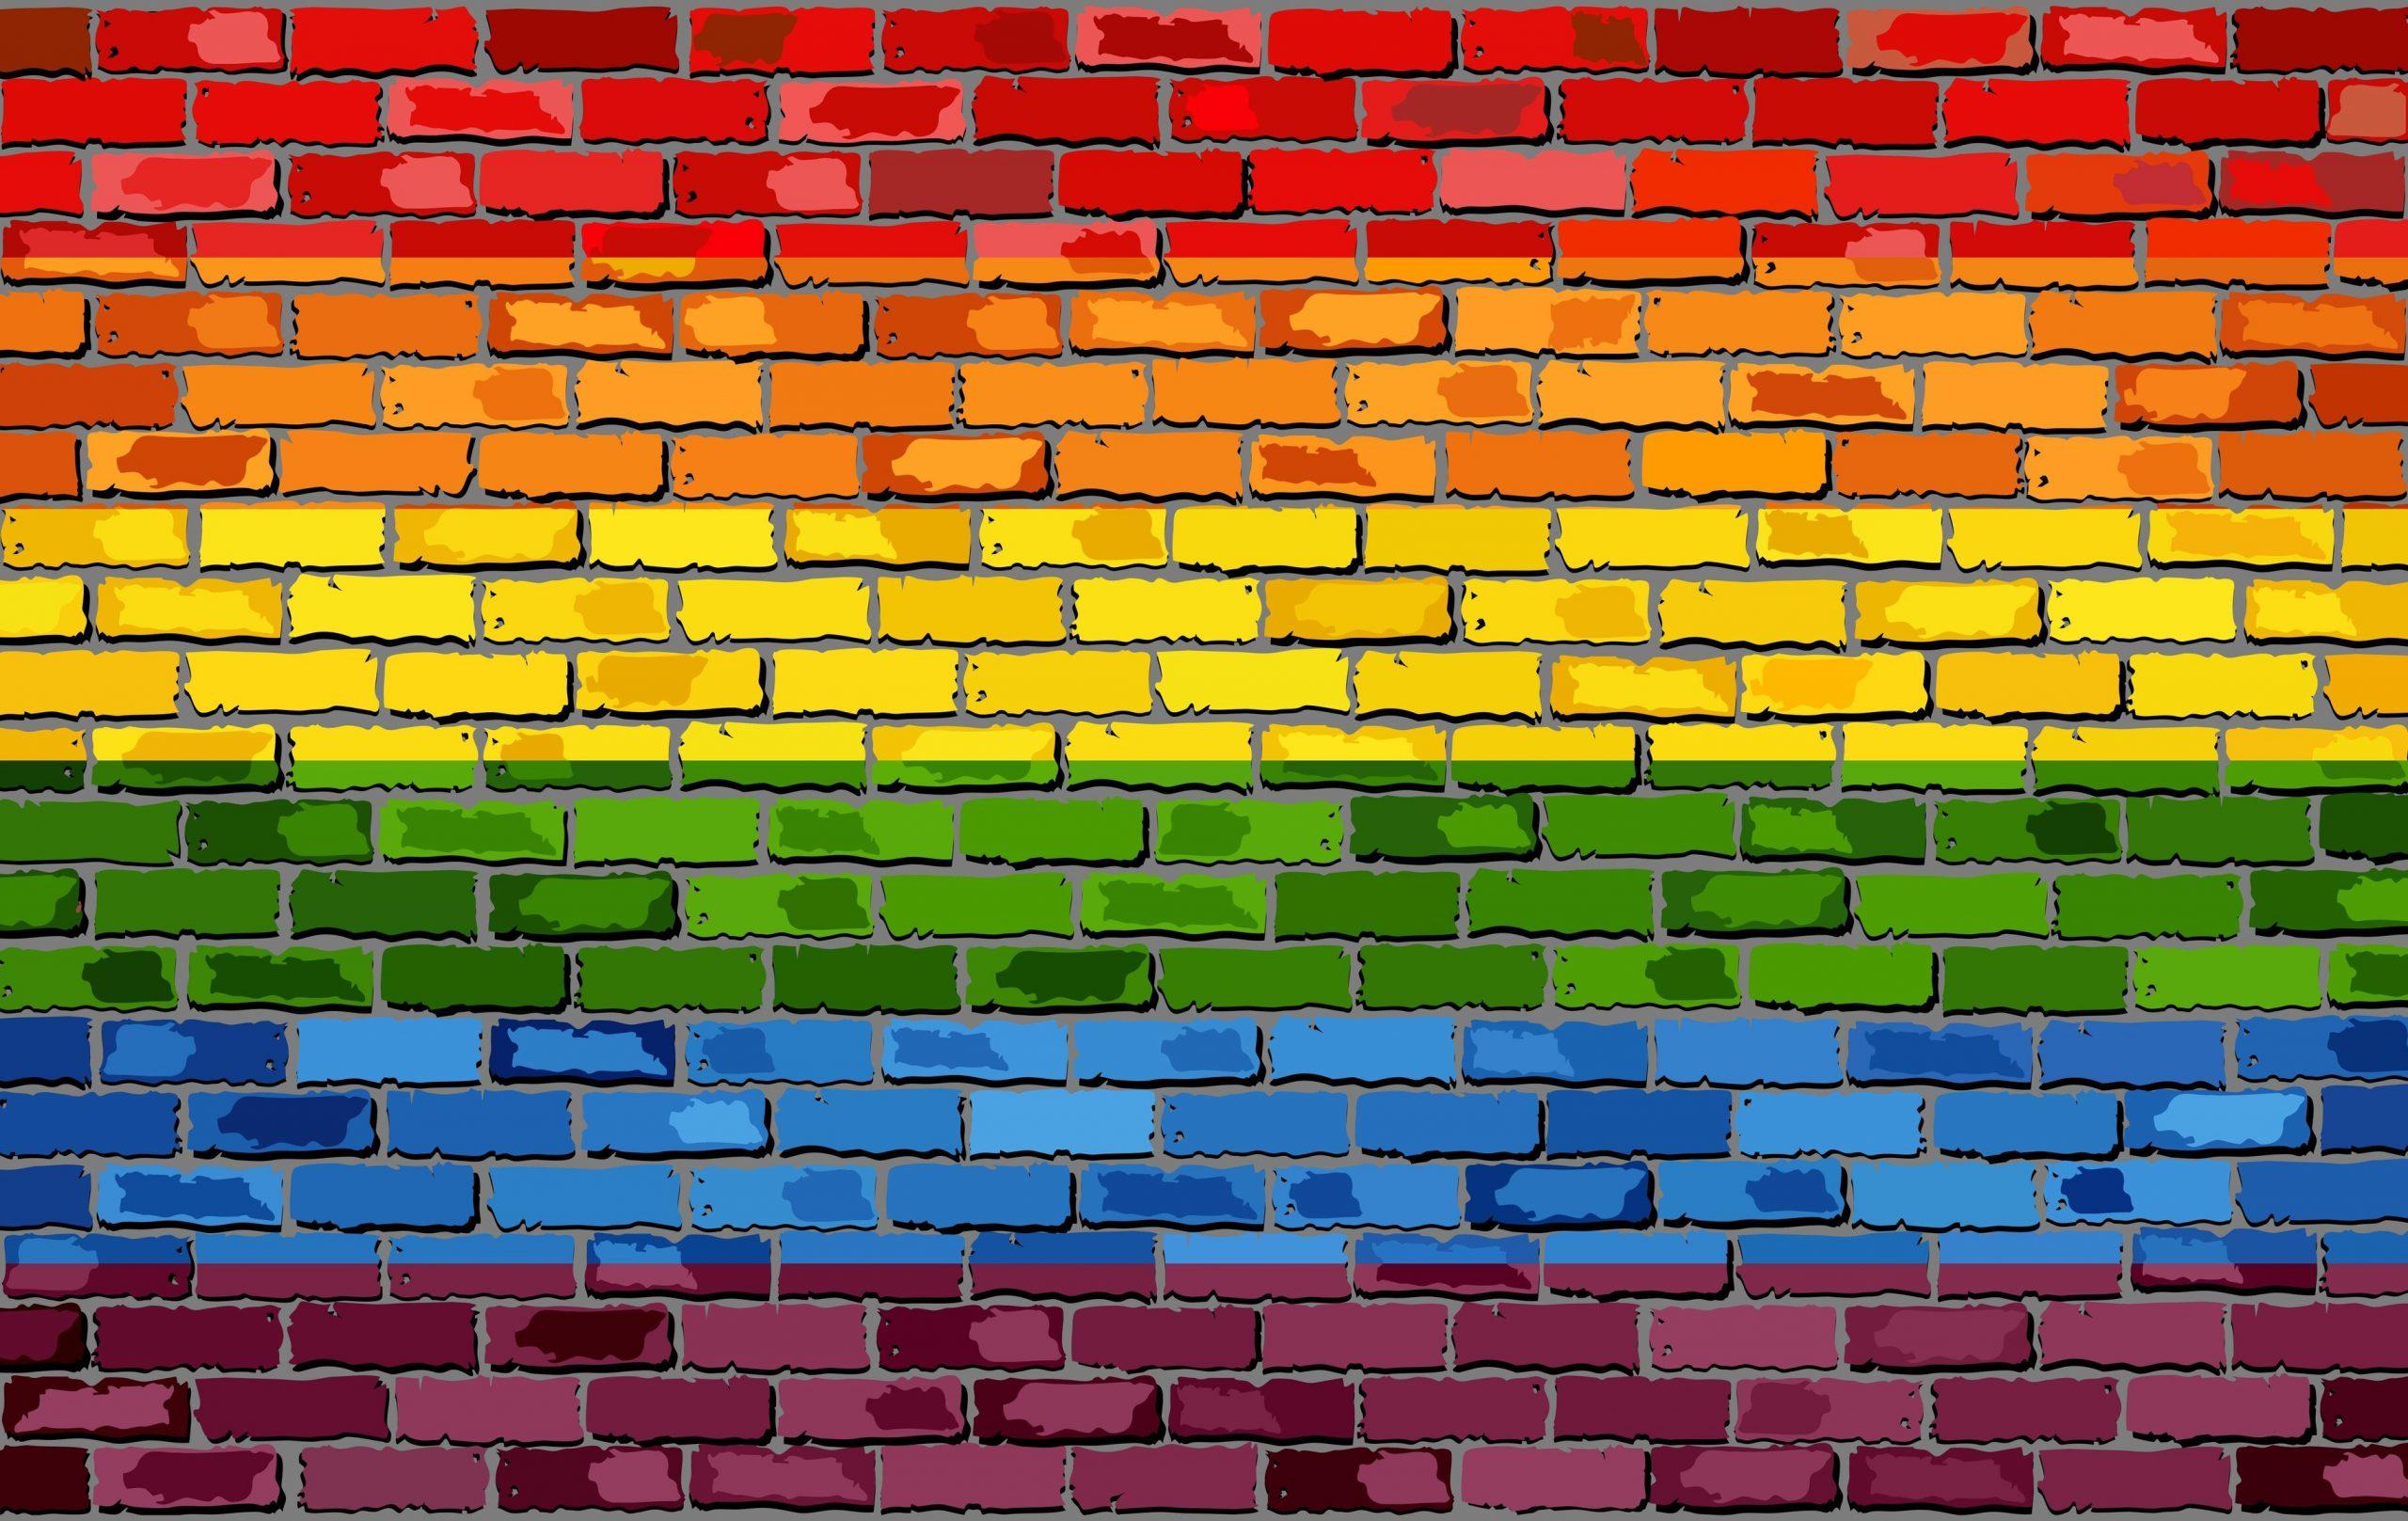 Kawartha Lakes Pride gets ready for week of fun starting July 5